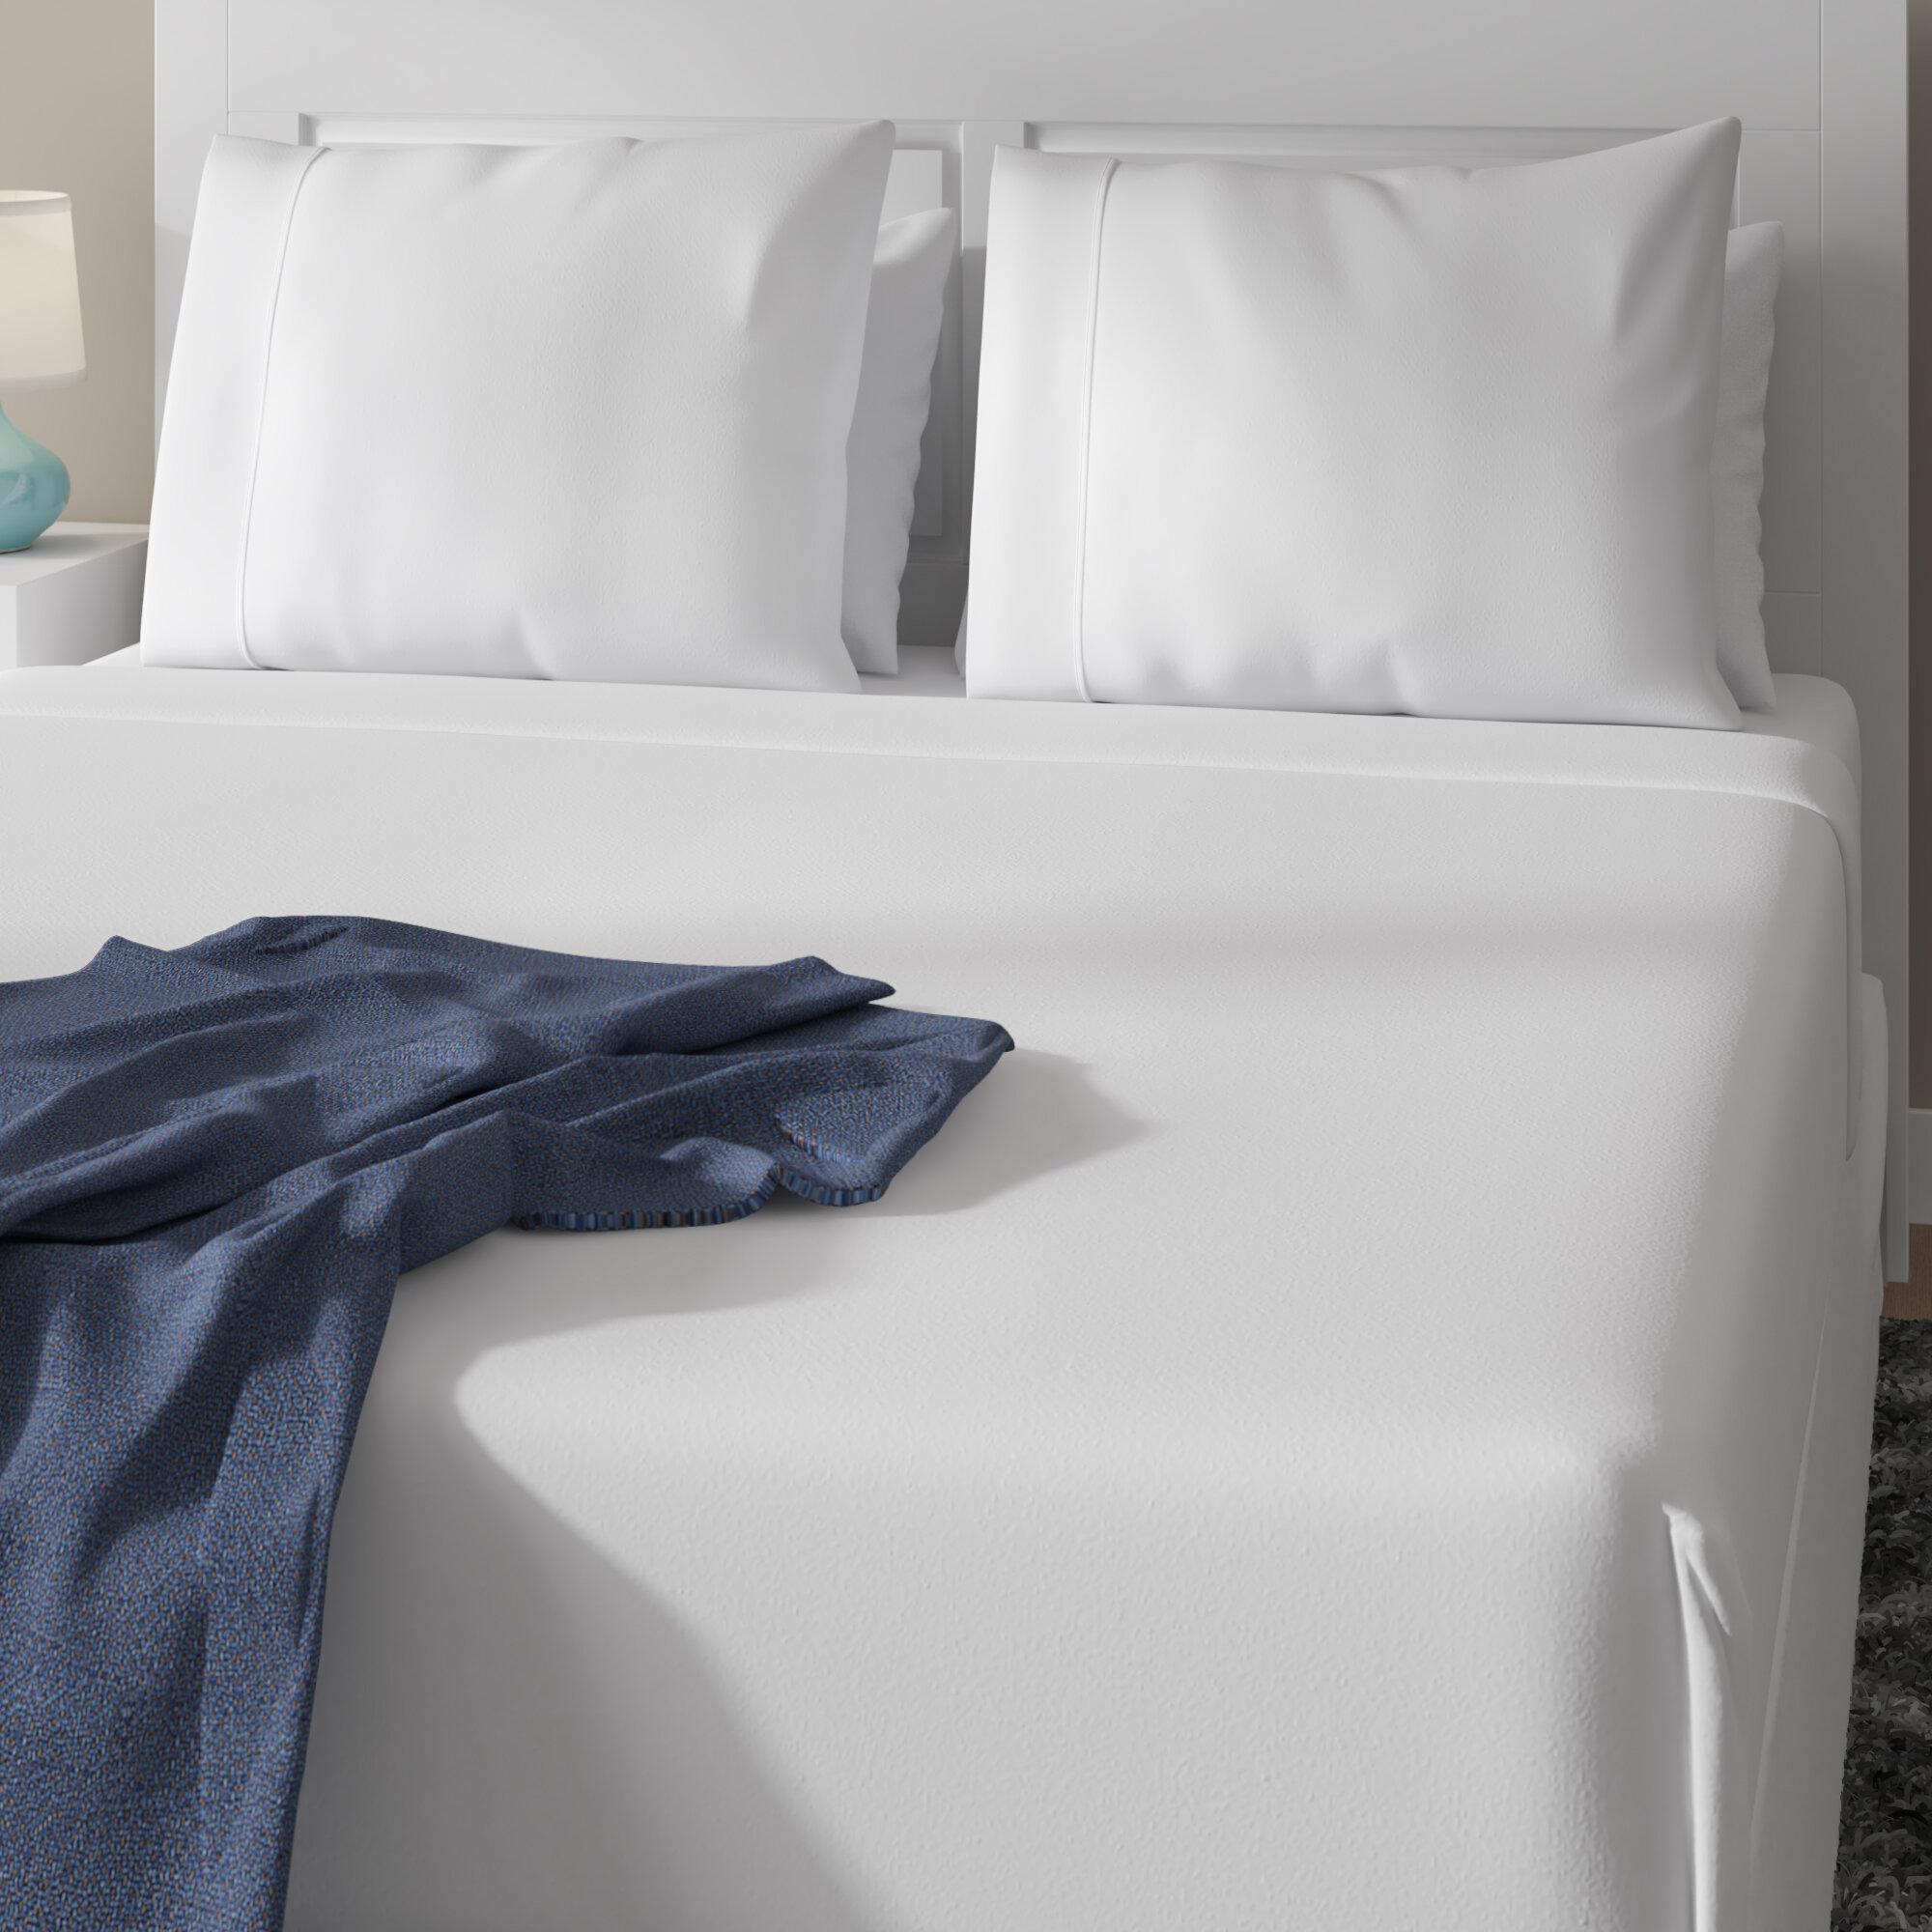 Alwyn Home Brushed Bed Sheet Set Reviews Wayfair